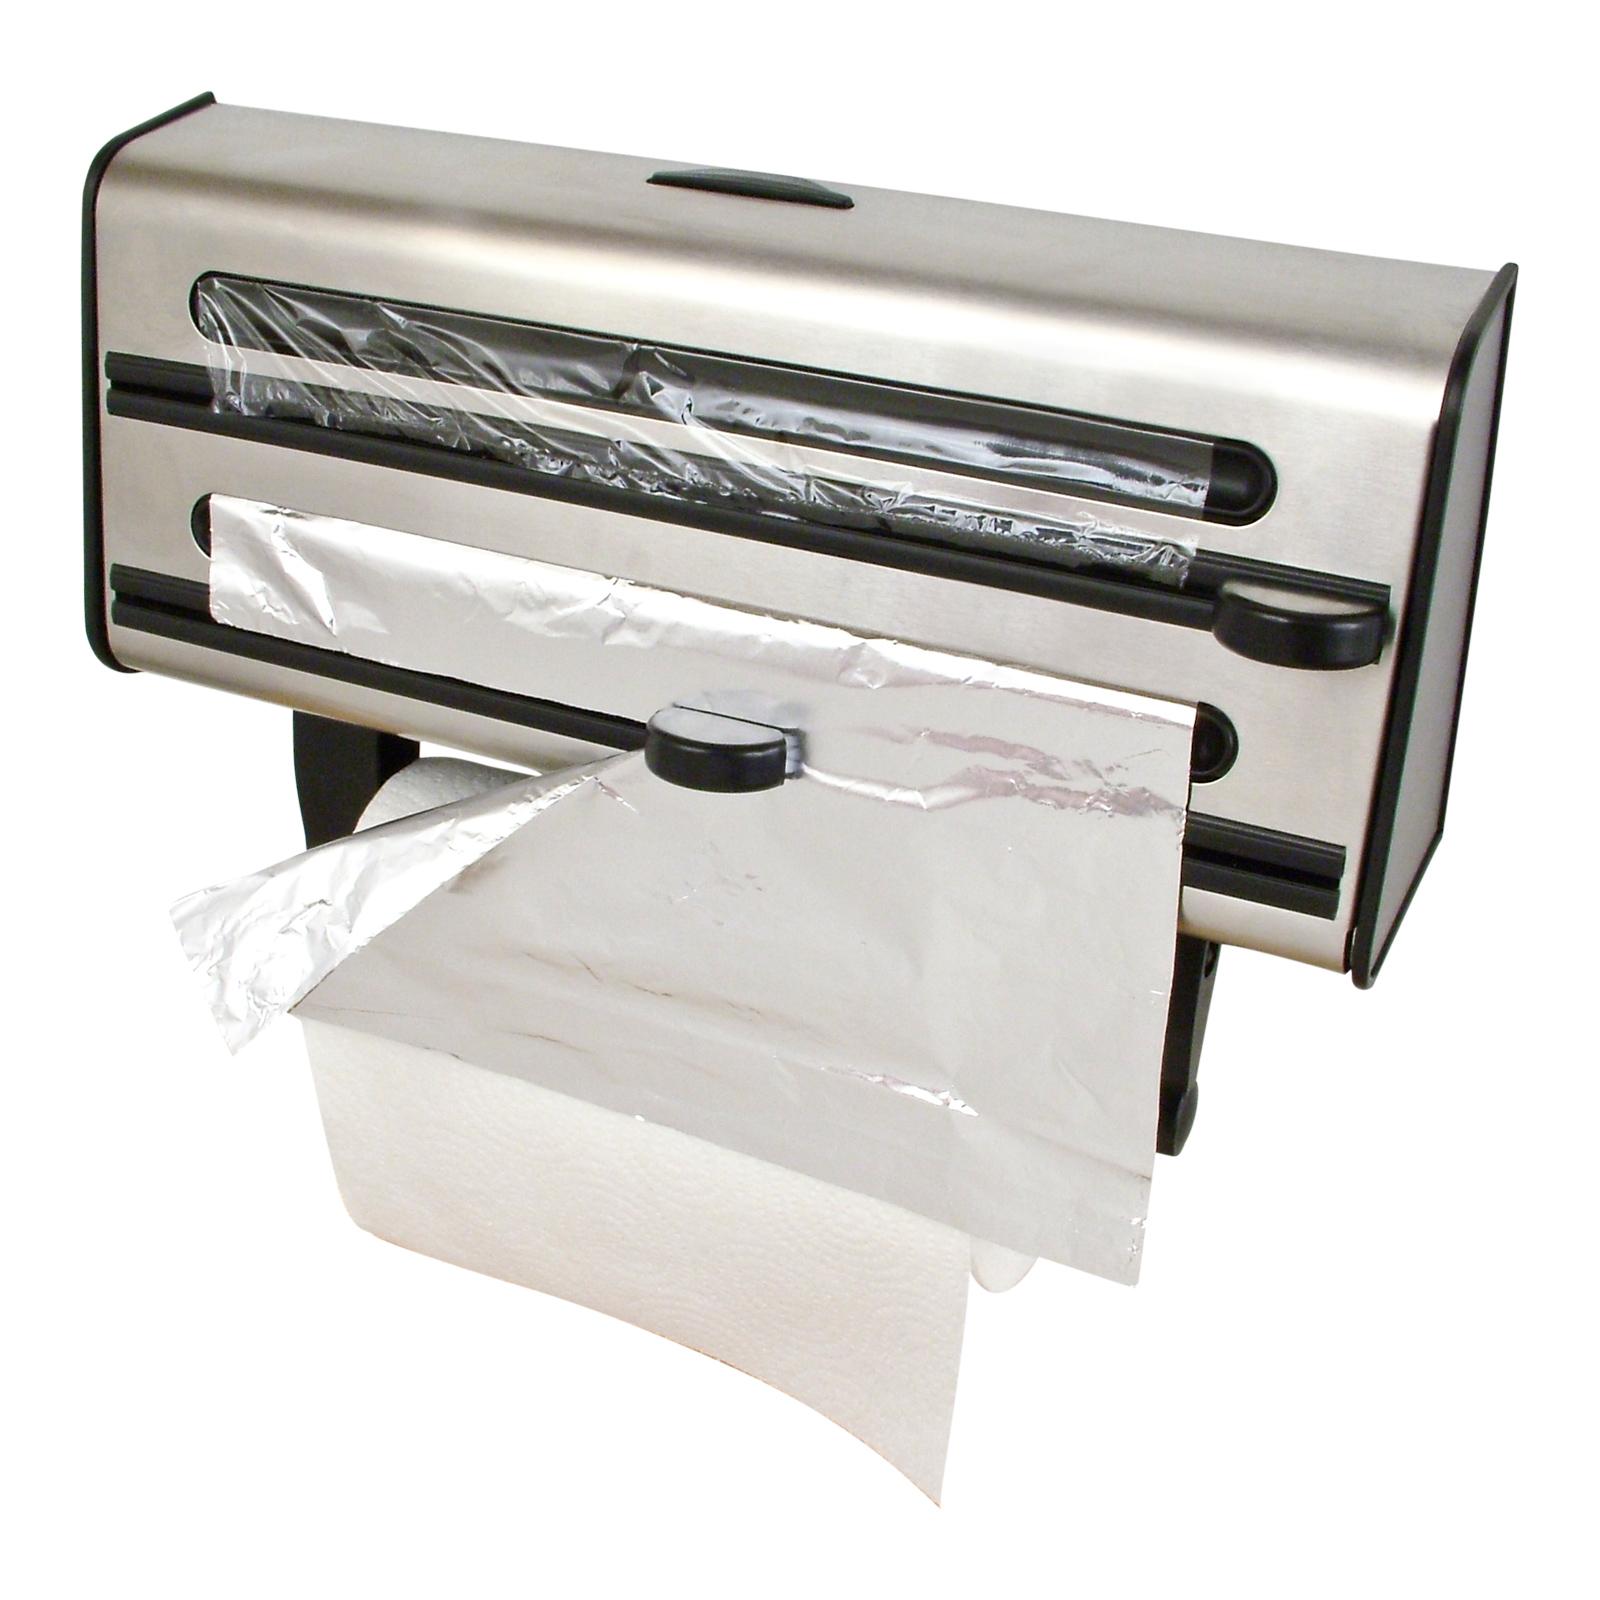 Awesome Kitchen Triple Roll Dispenser Cling Film Tin Foil Towel Holder